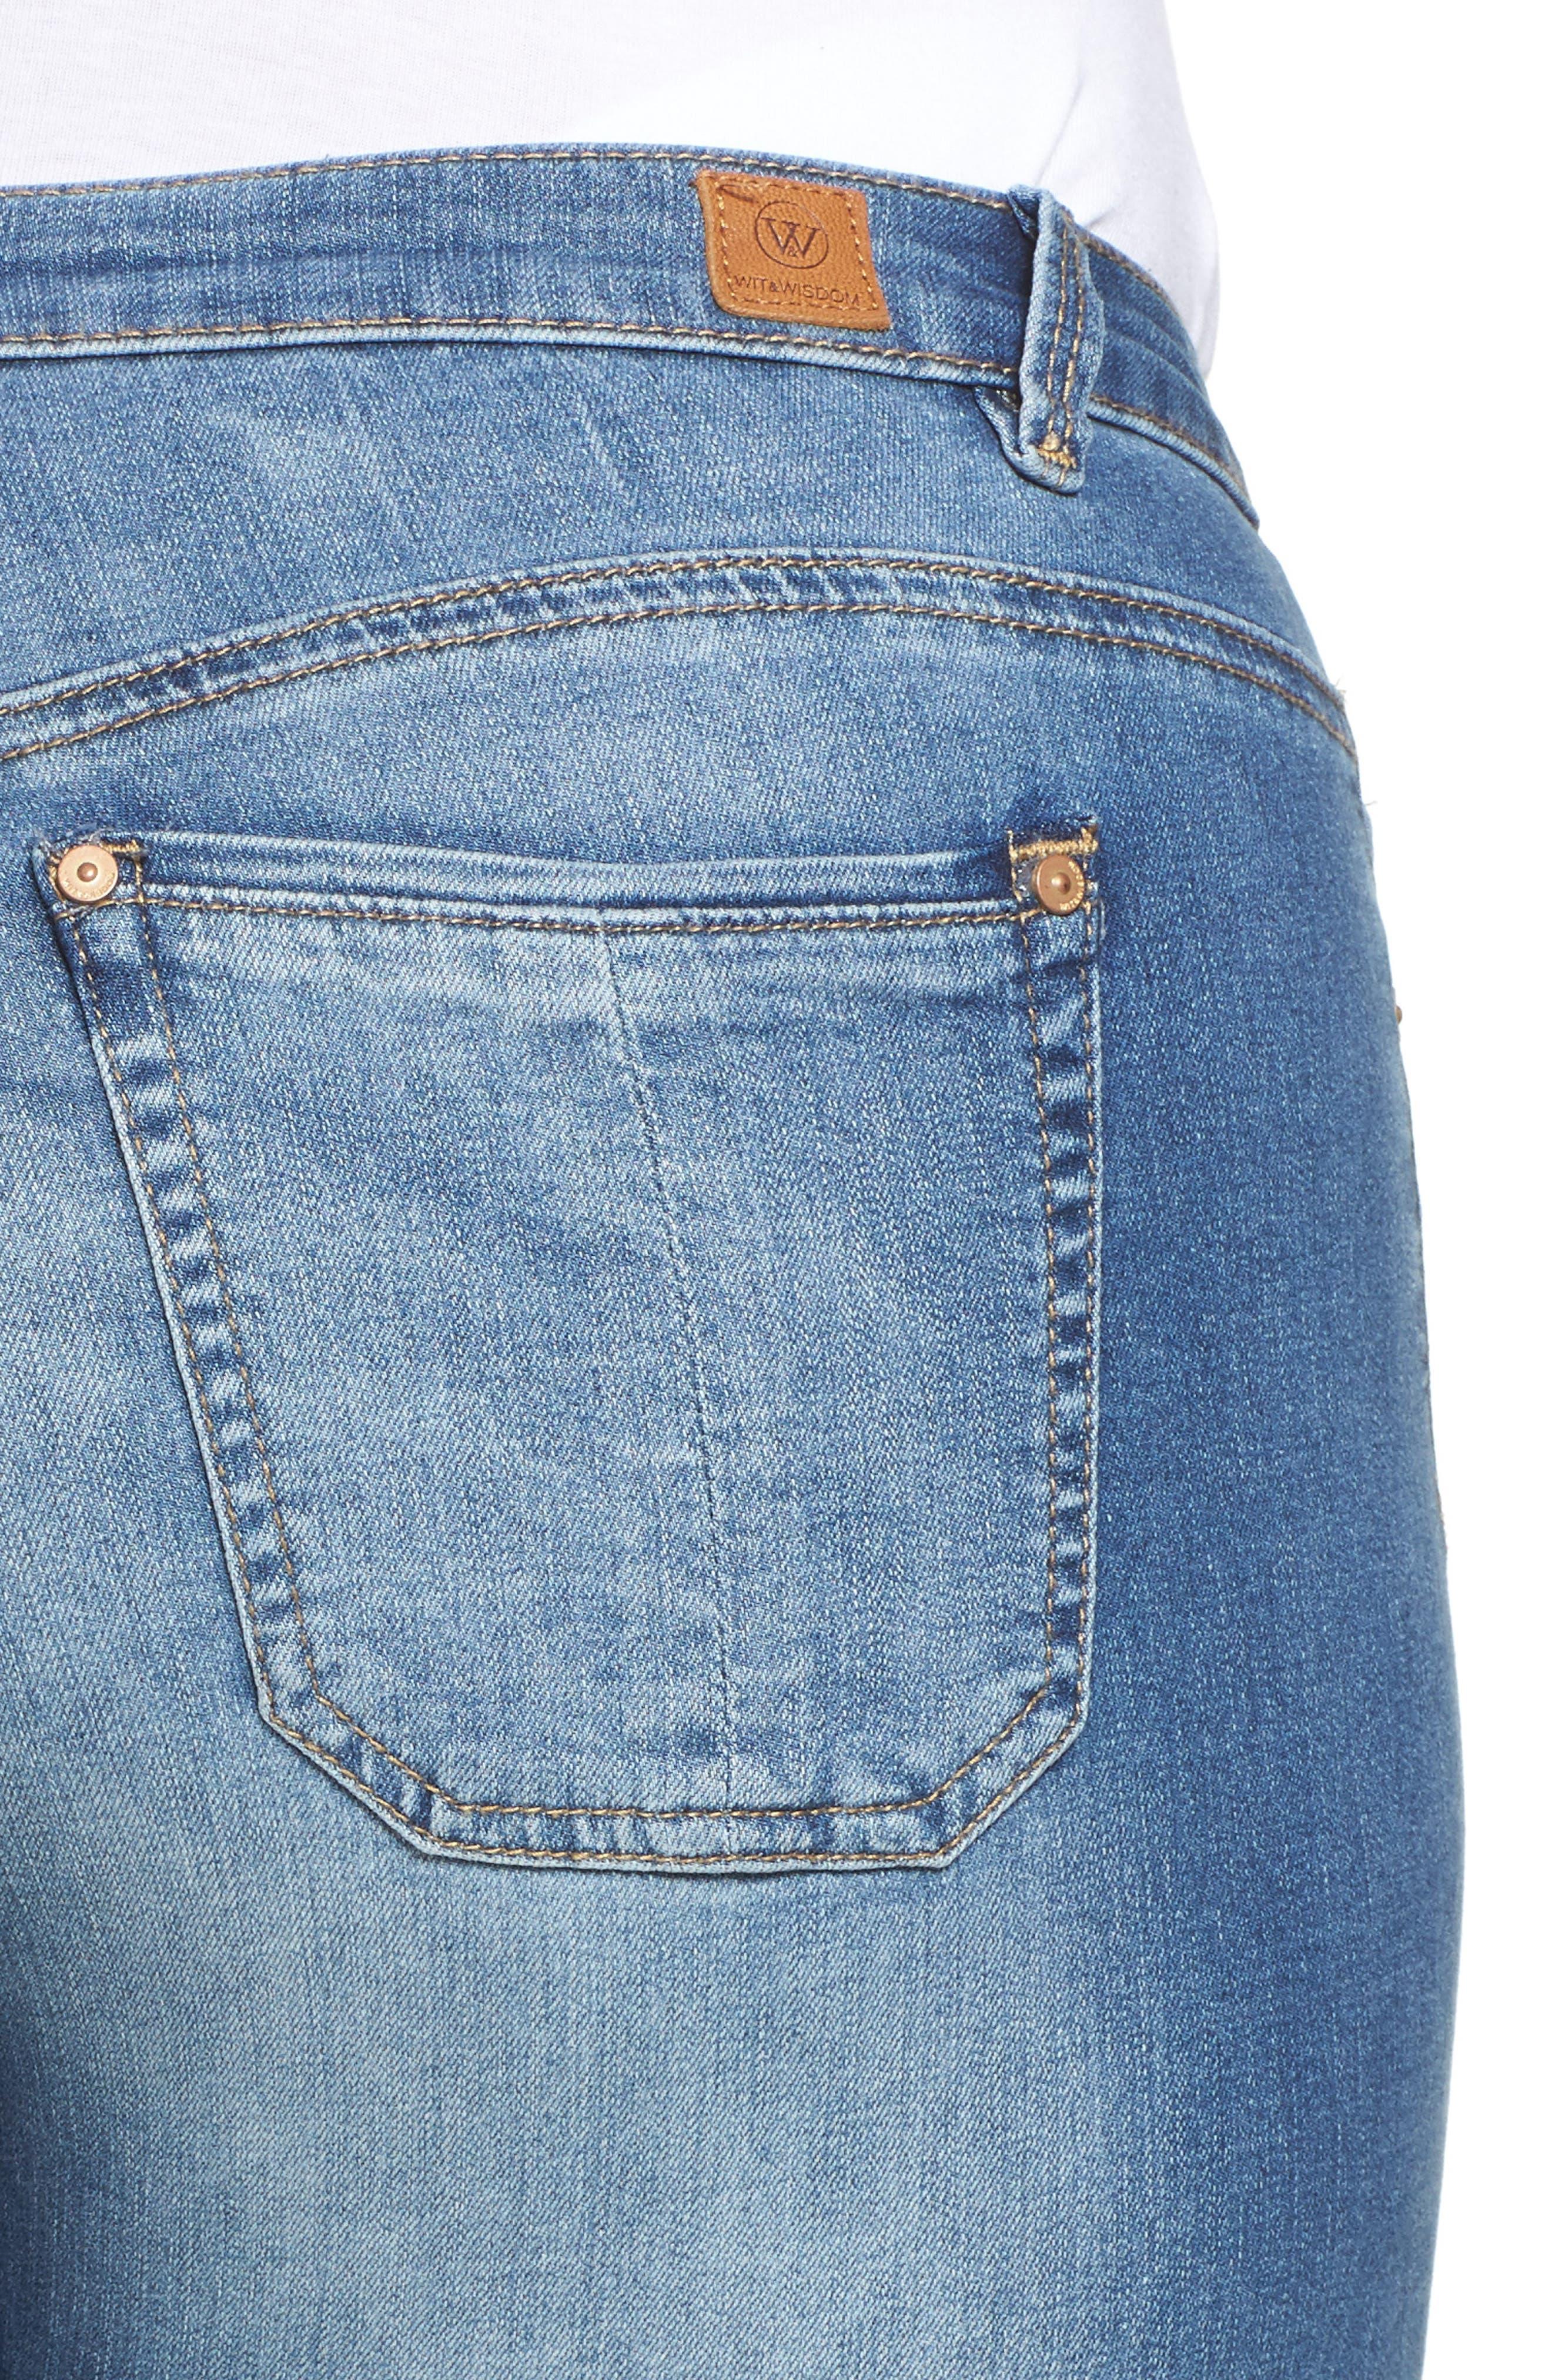 Alternate Image 4  - Wit & Wisdom Frayed Hem Skinny Jeans (Plus Size) (Nordstrom Exclusive)